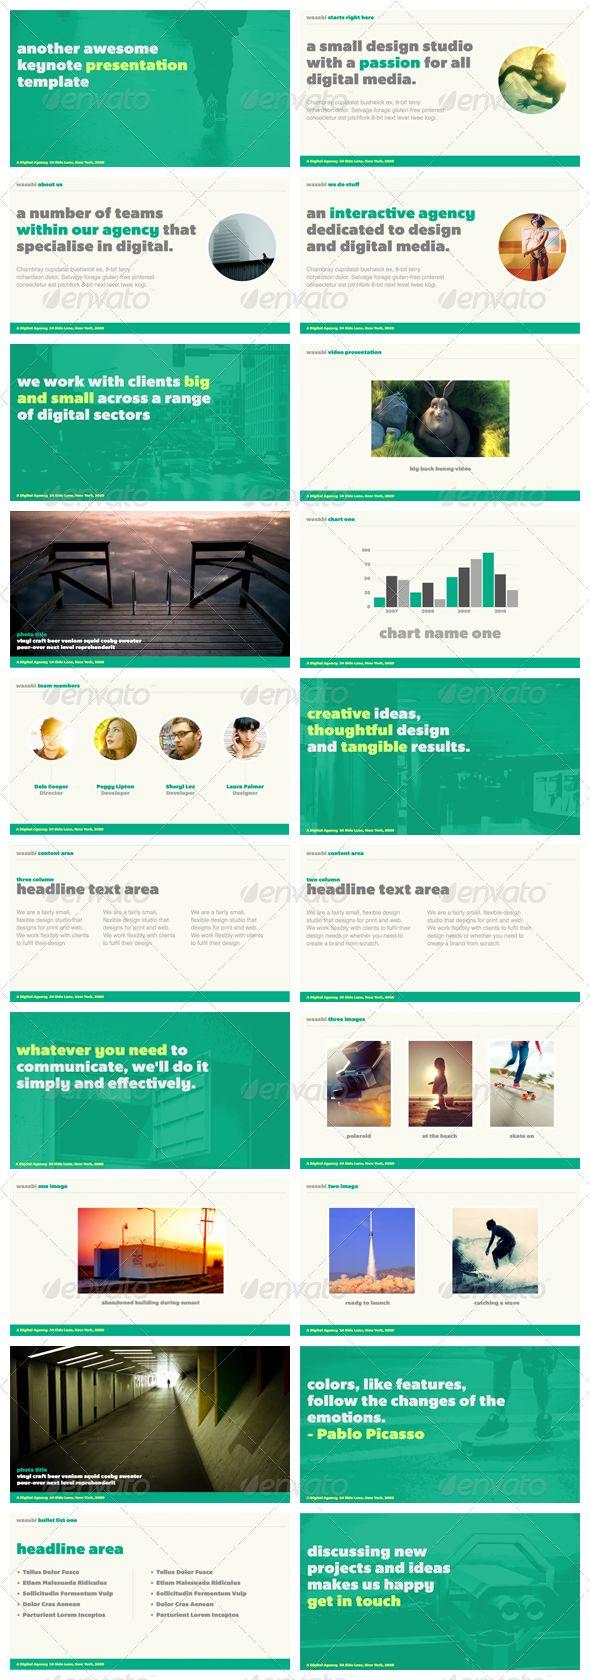 Steve Jobs: 10 Presentation Tactics for Ad Agency New Business